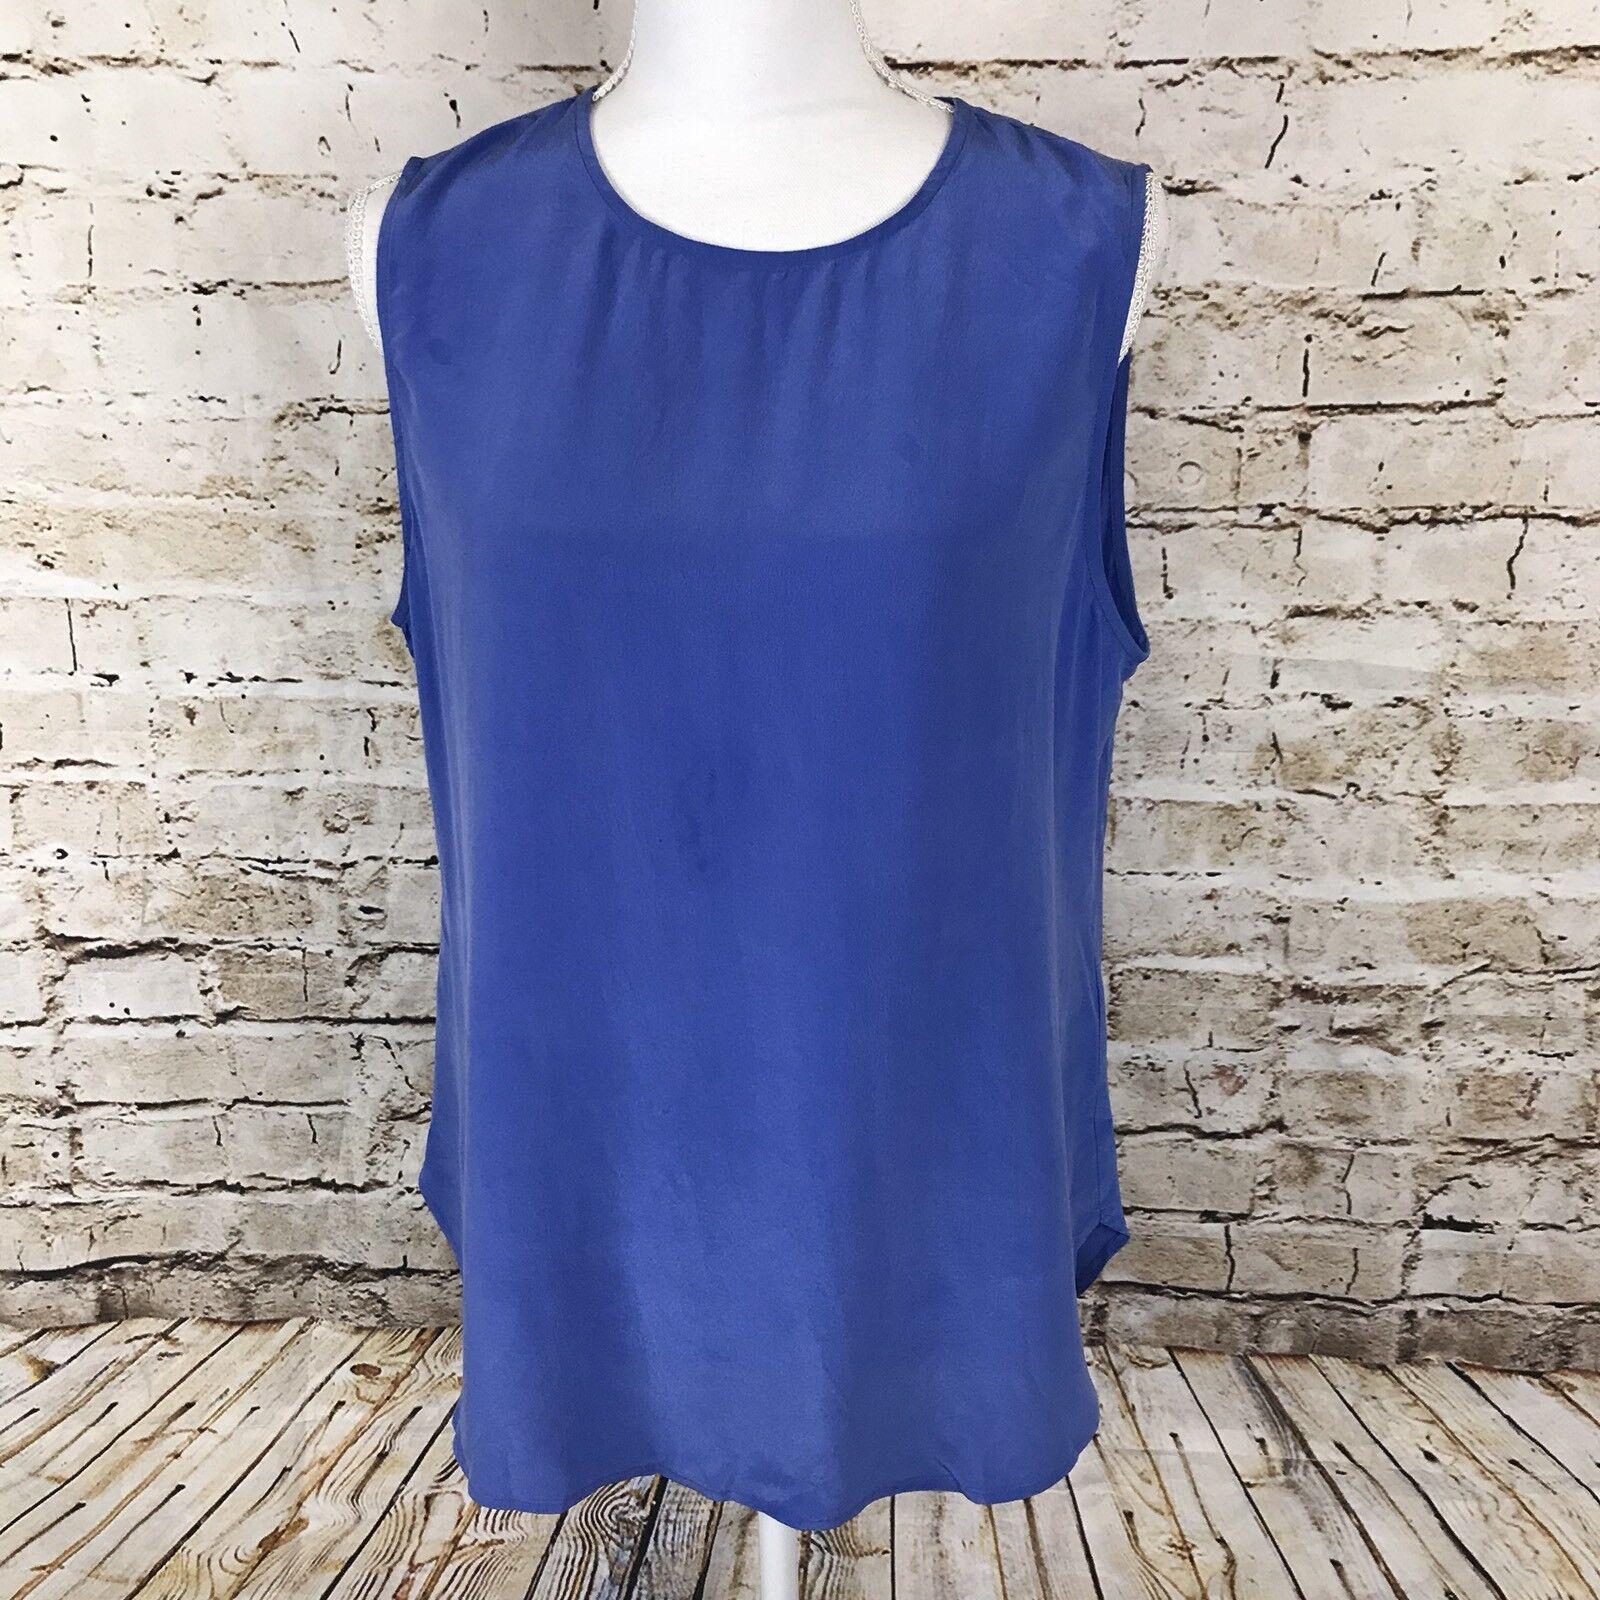 Equipment Femme damen Sleeveless Blouse Periwinkle Blau Größe Large 100% Silk